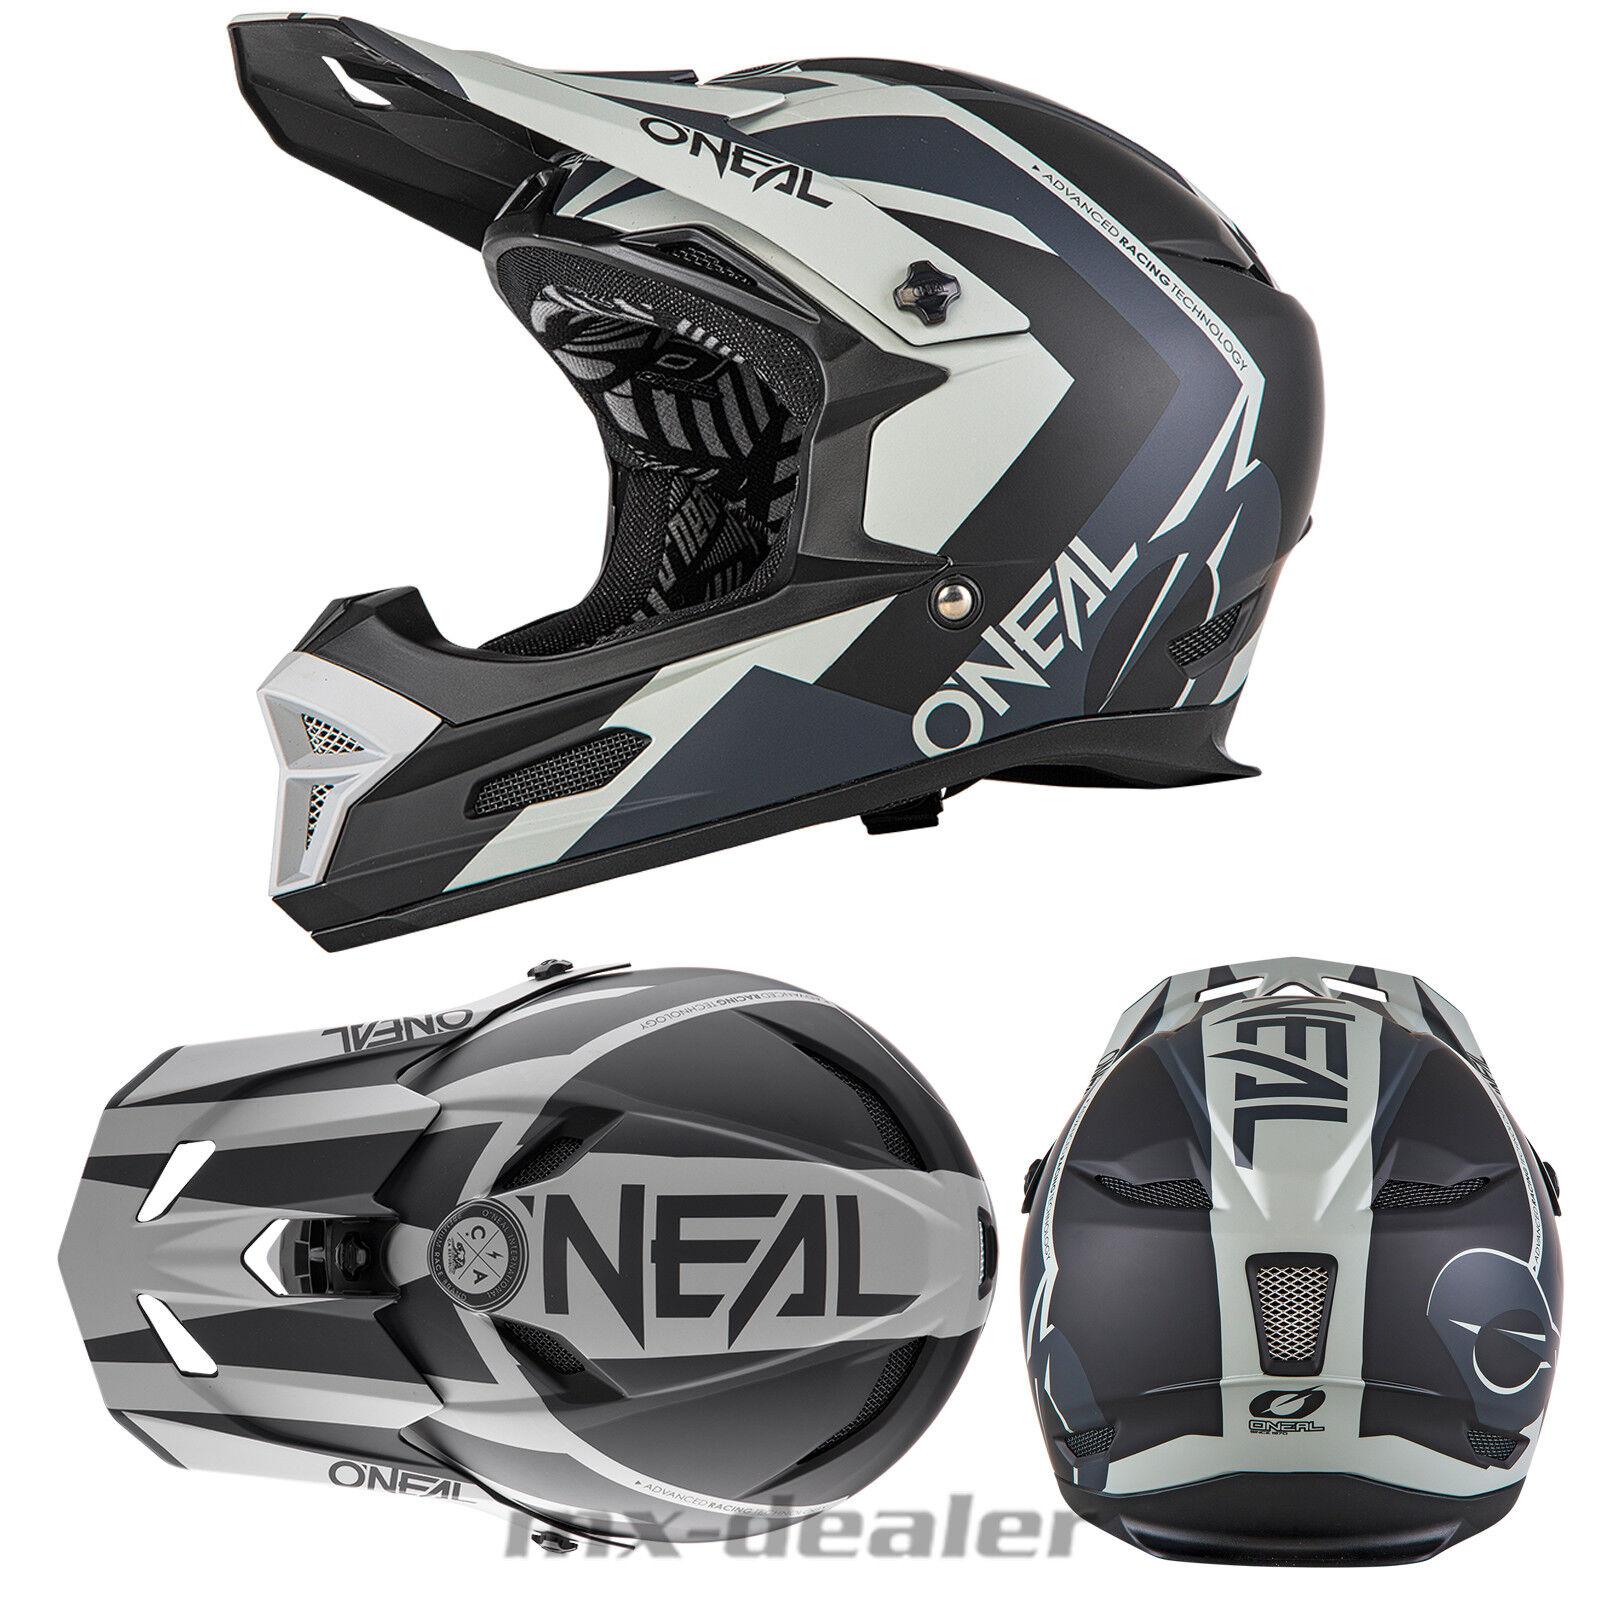 O'Neal 19 Fury Rl Hybrid Negro MTB Dh Downhill Casco Freeride Go pro Soporte